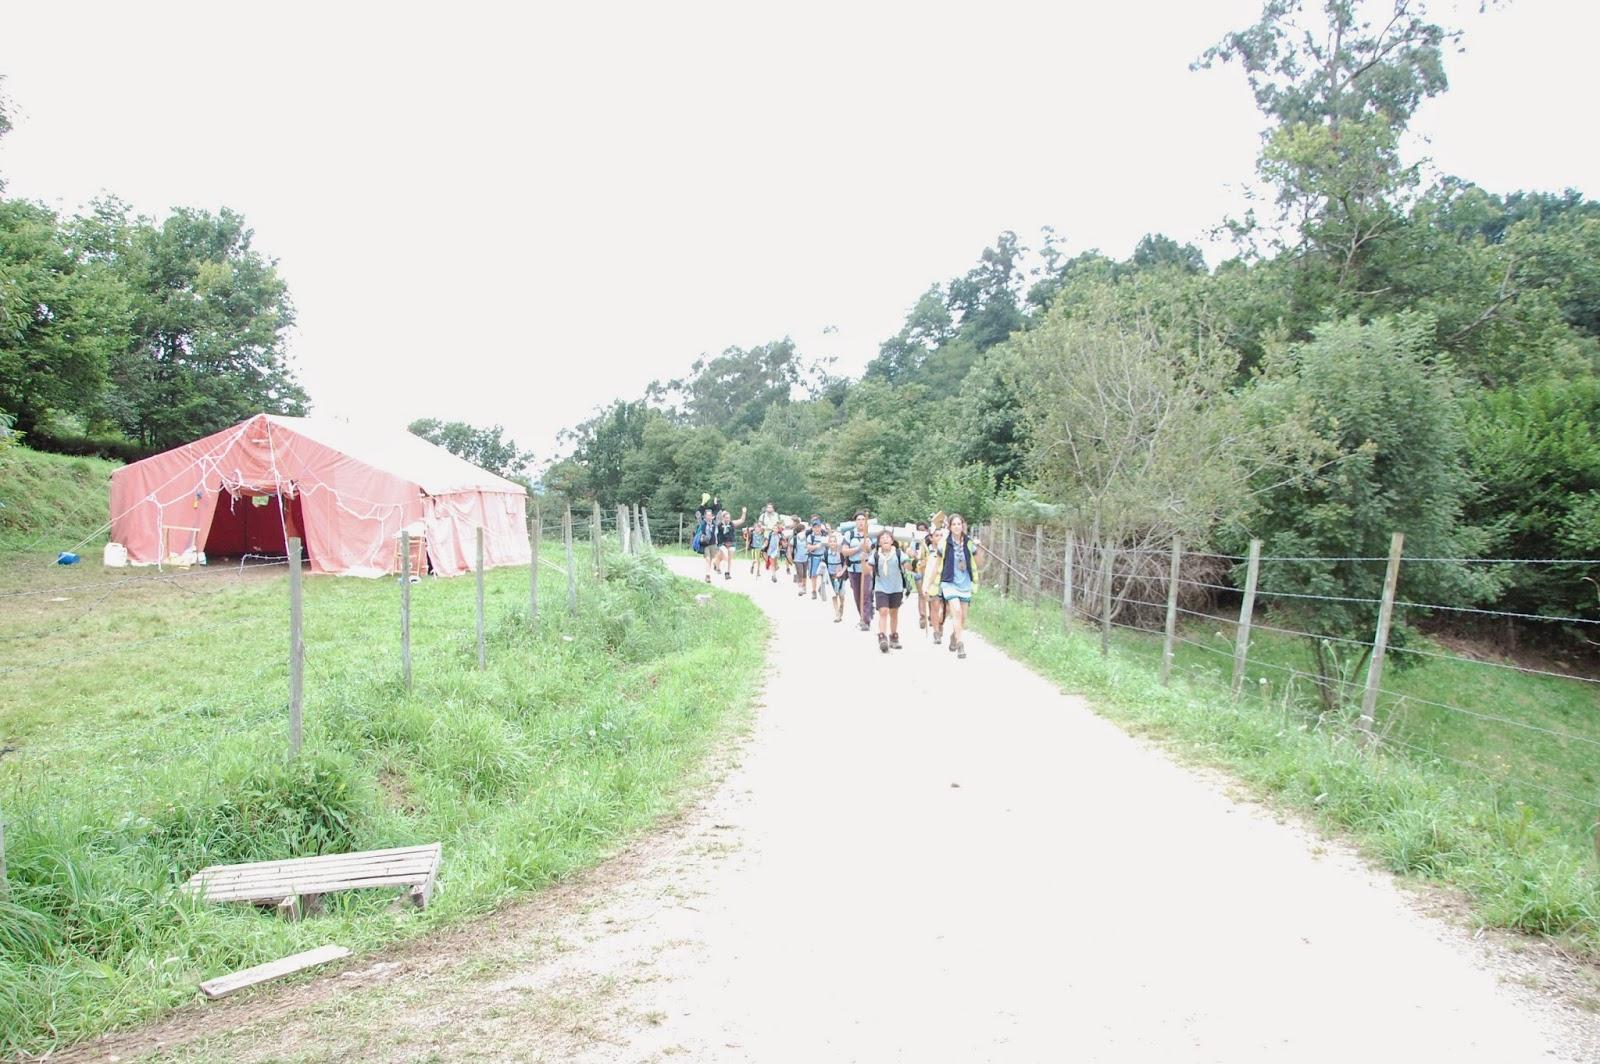 Campaments Estiu RolandKing 2011 - DSC_0020.JPG